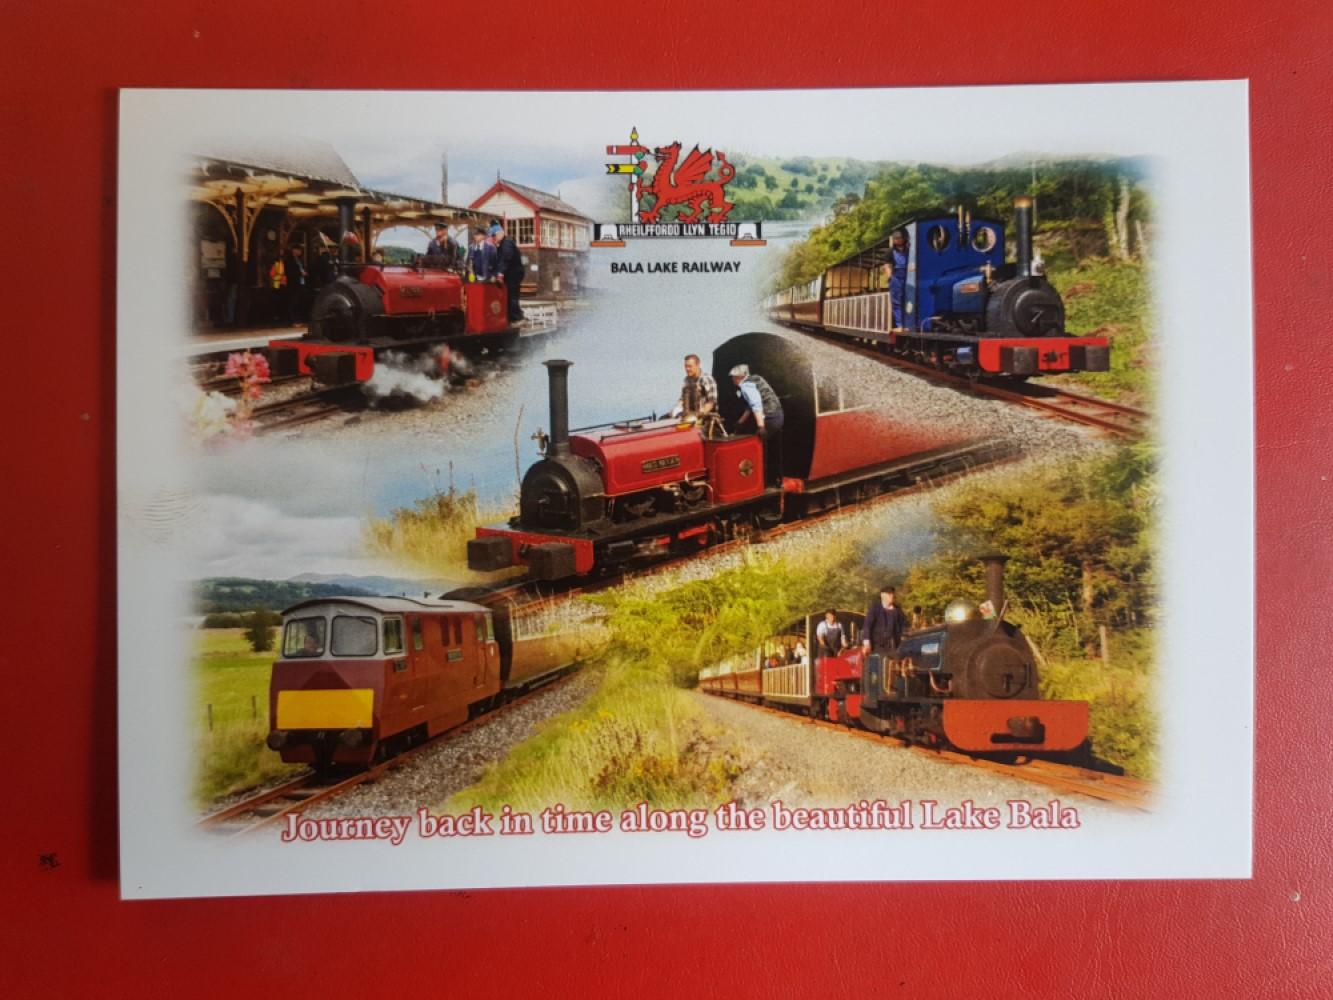 Bala Lake Railway Montage Postcard